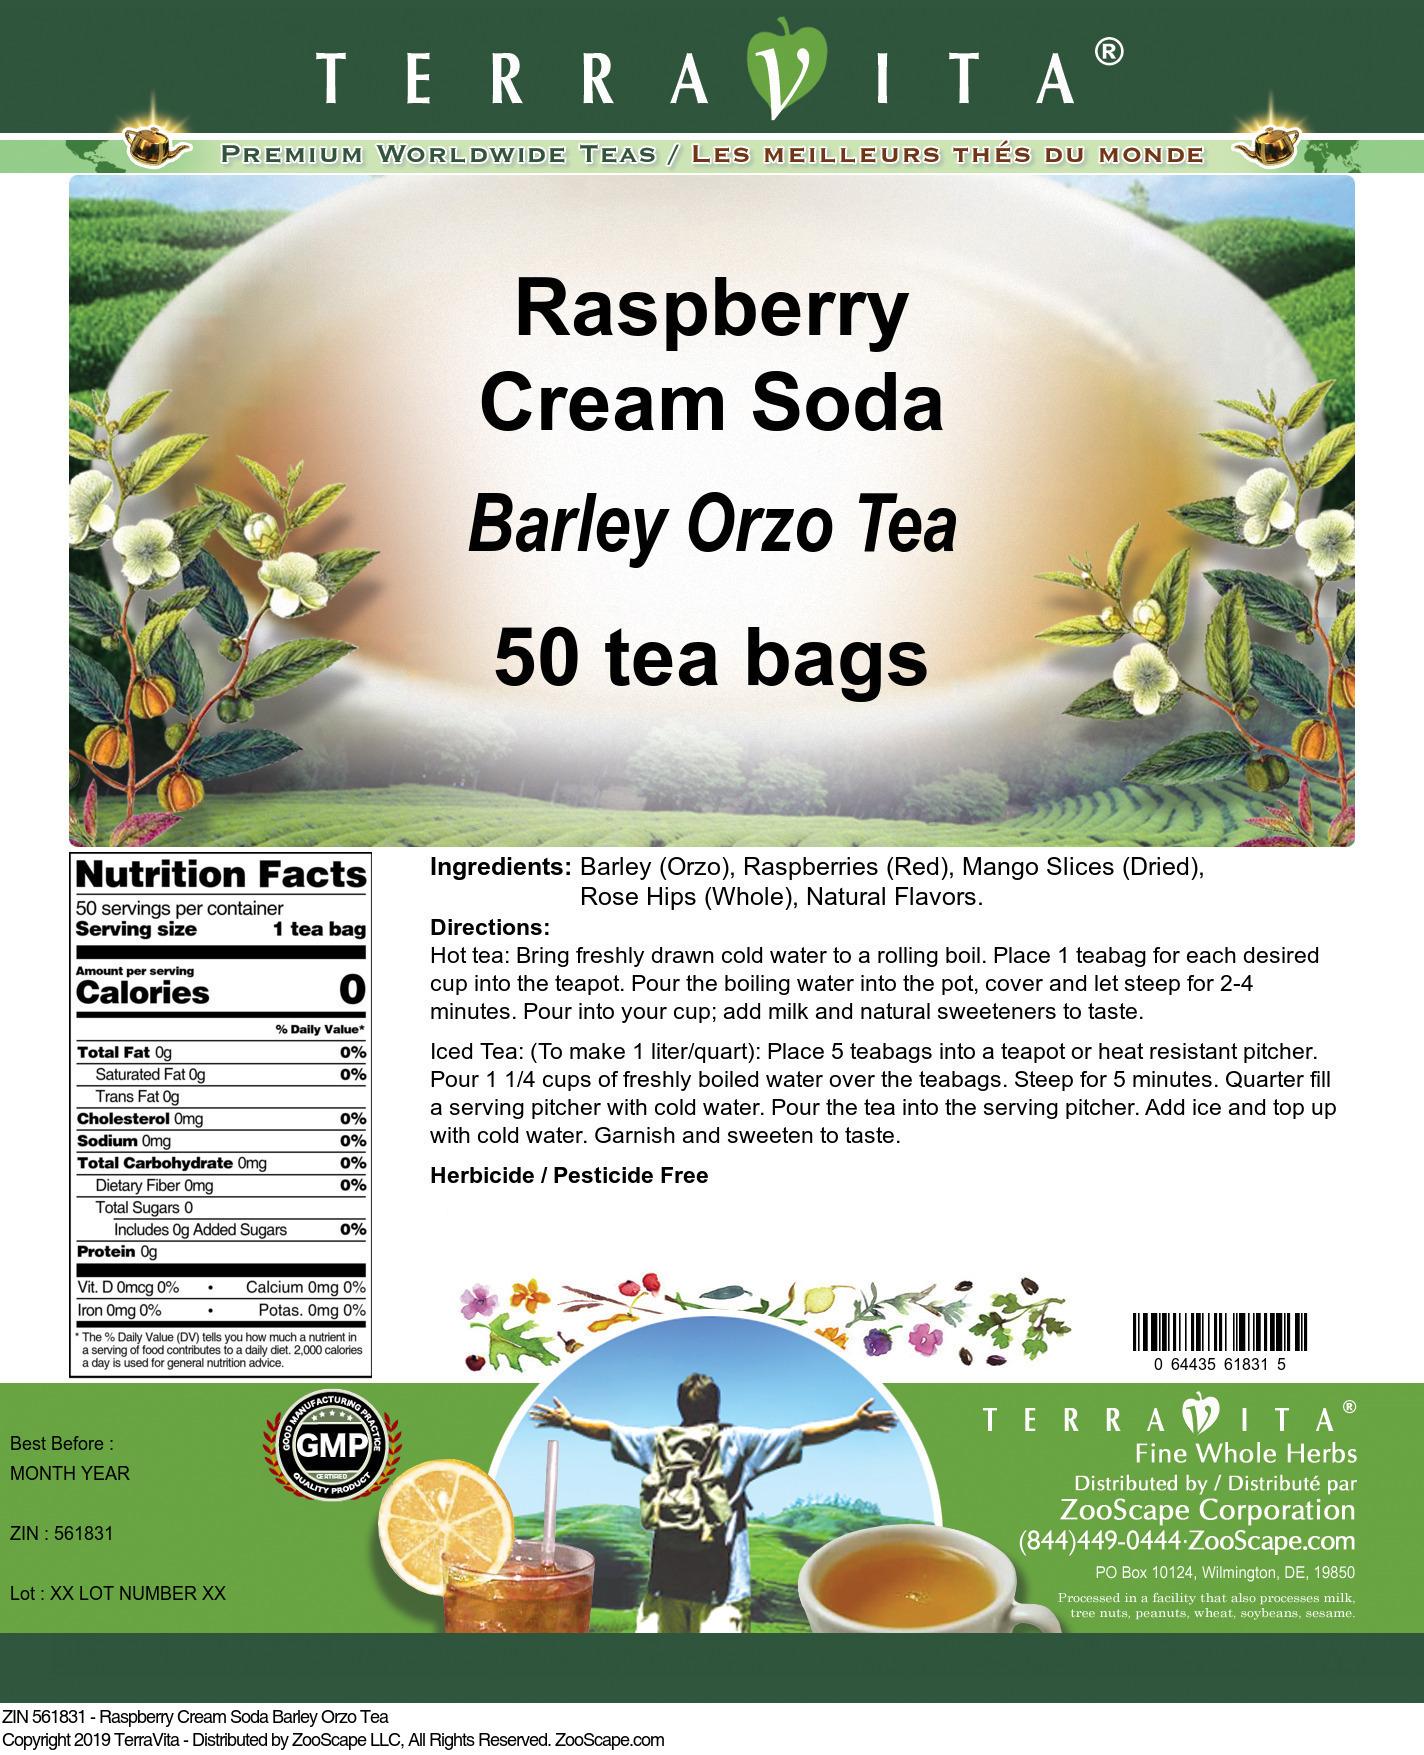 Raspberry Cream Soda Barley Orzo Tea